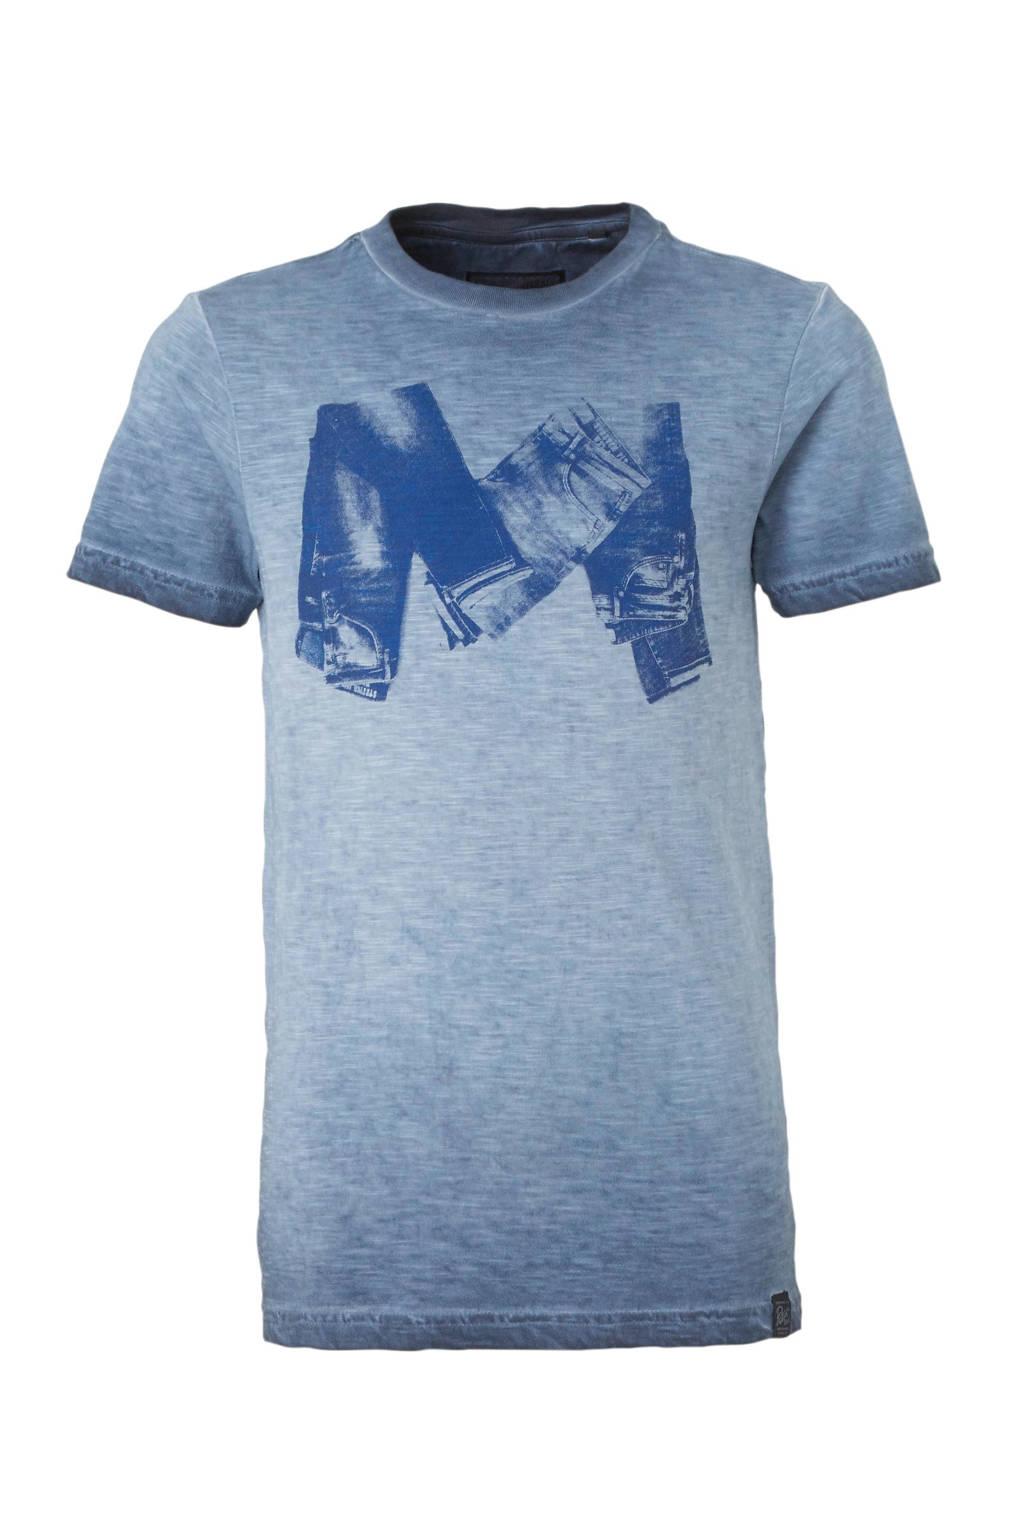 Petrol Industries T-shirt met printopdruk blauw, Blauw